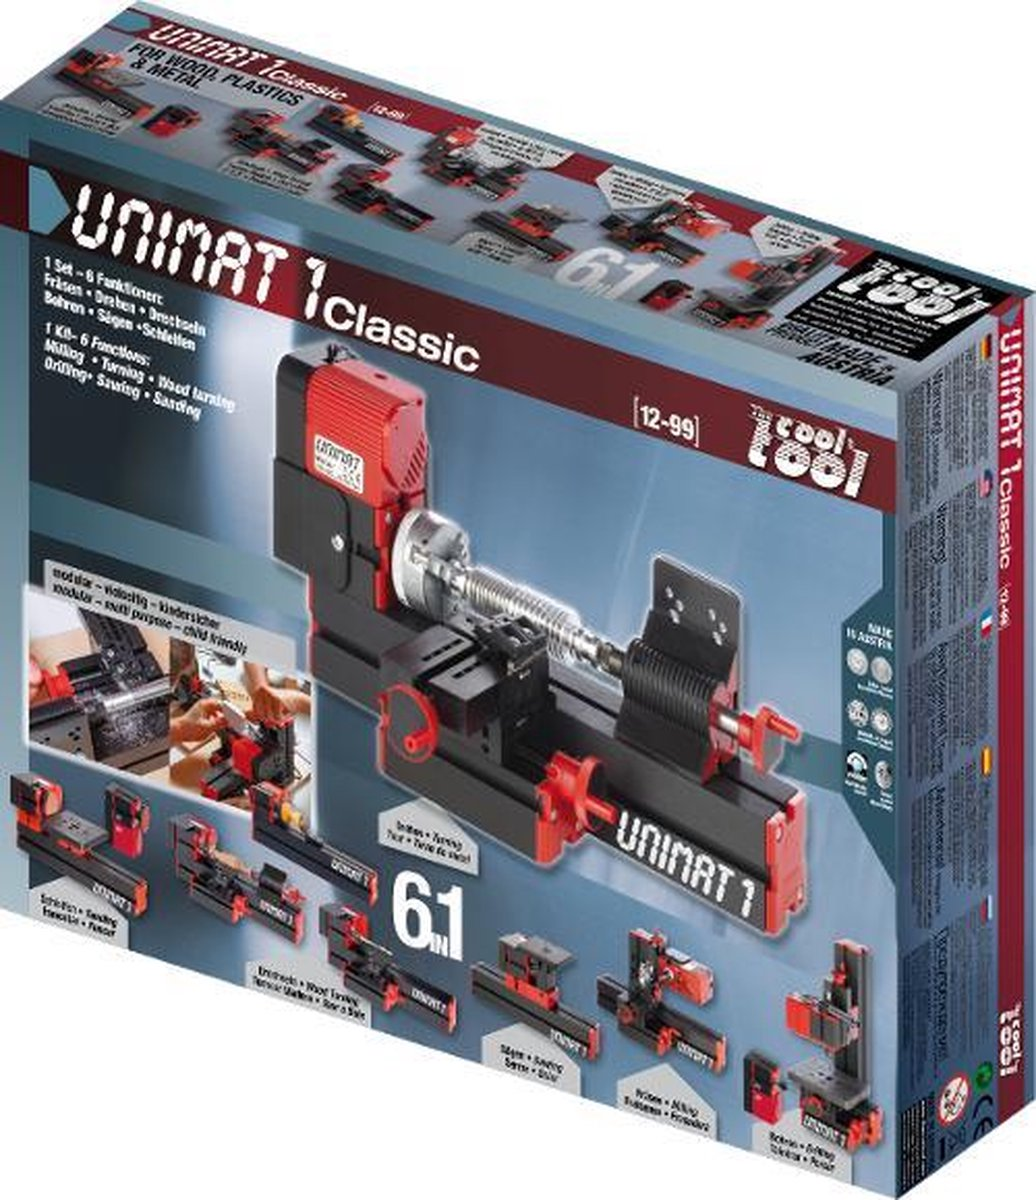 TheCoolTool UNIMAT 1 Classic 6-1 Hobby en Modelbouw machine